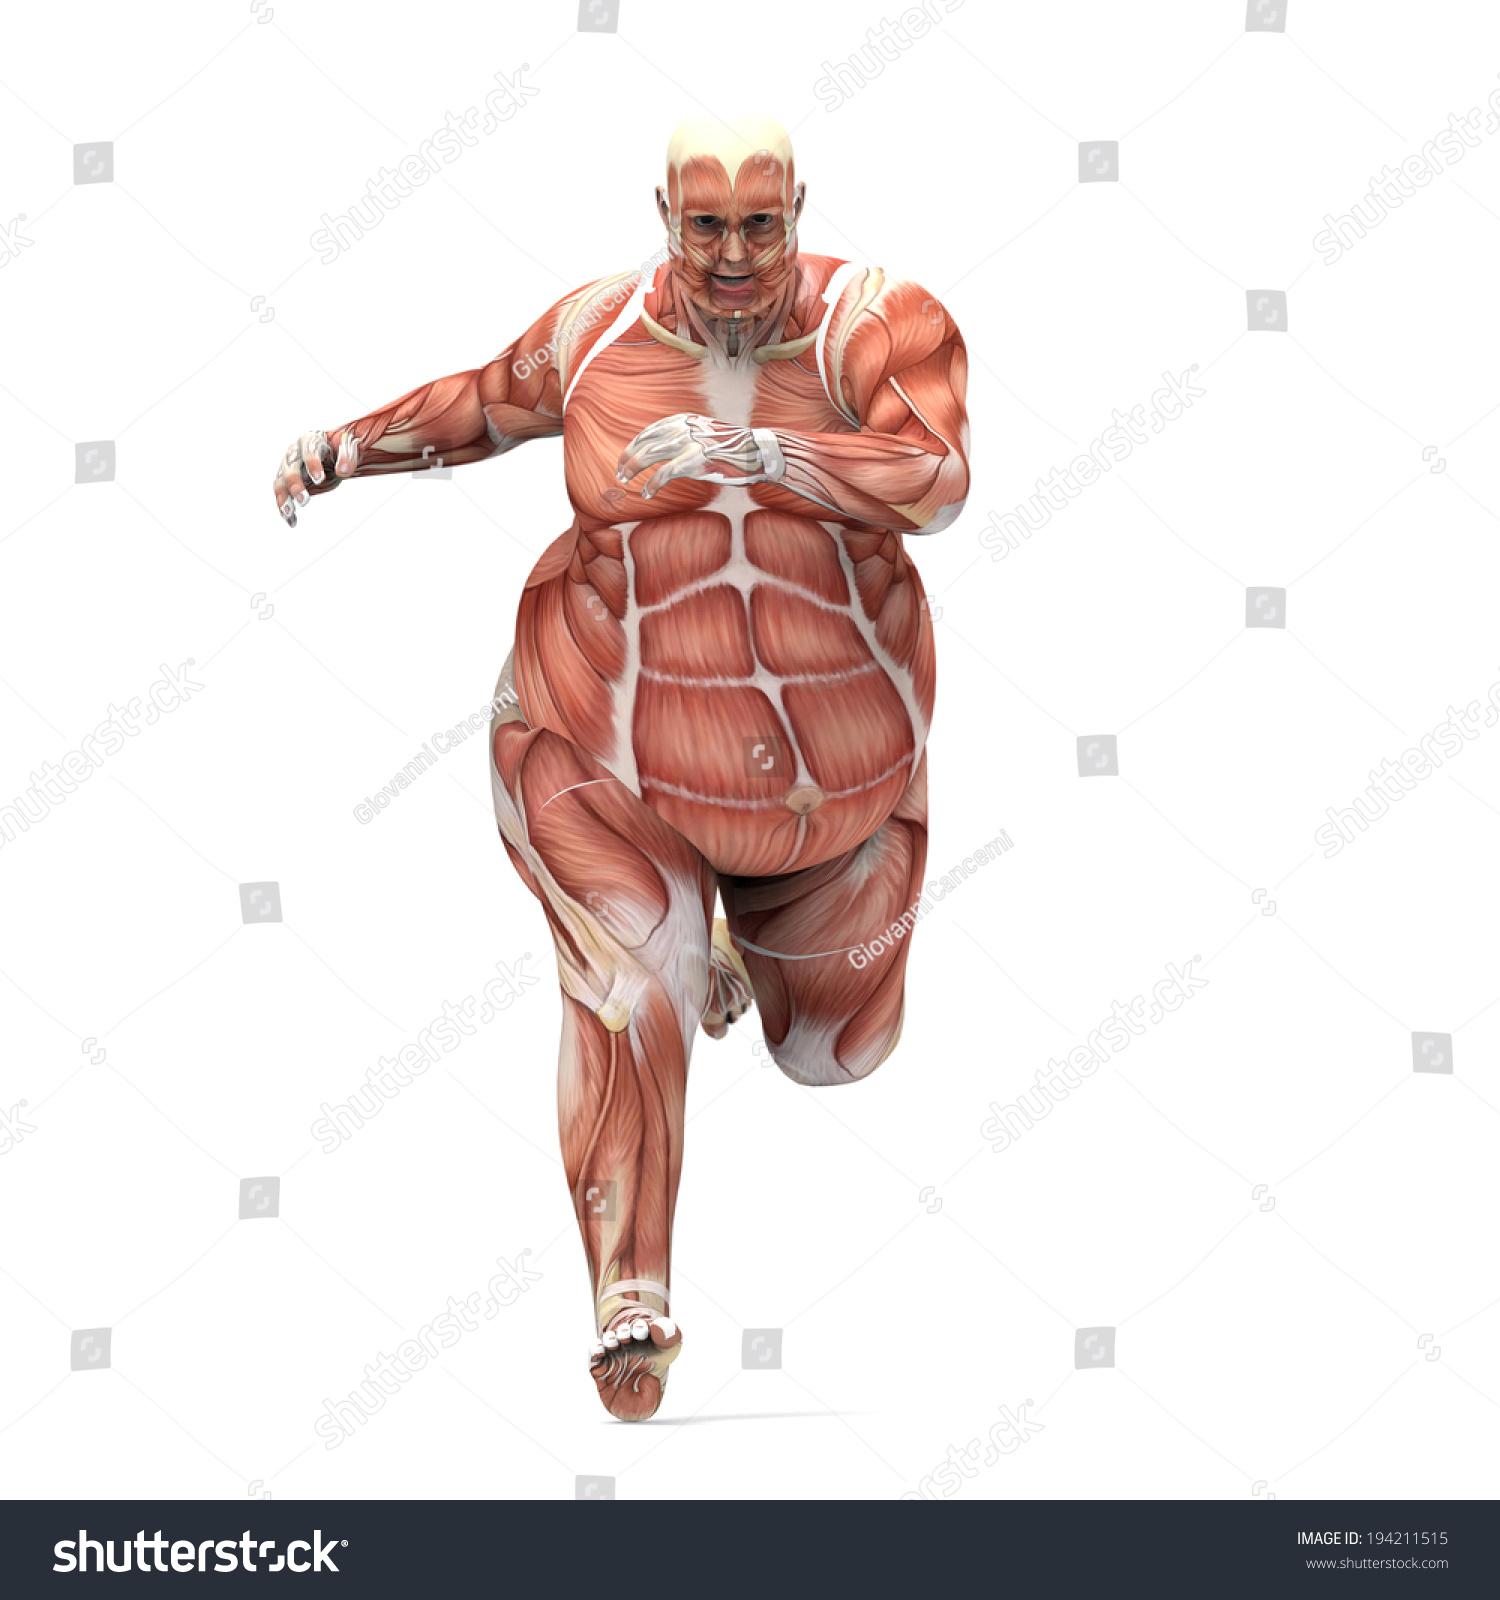 Anatomy Obese Man Running Stock Illustration 194211515 - Shutterstock